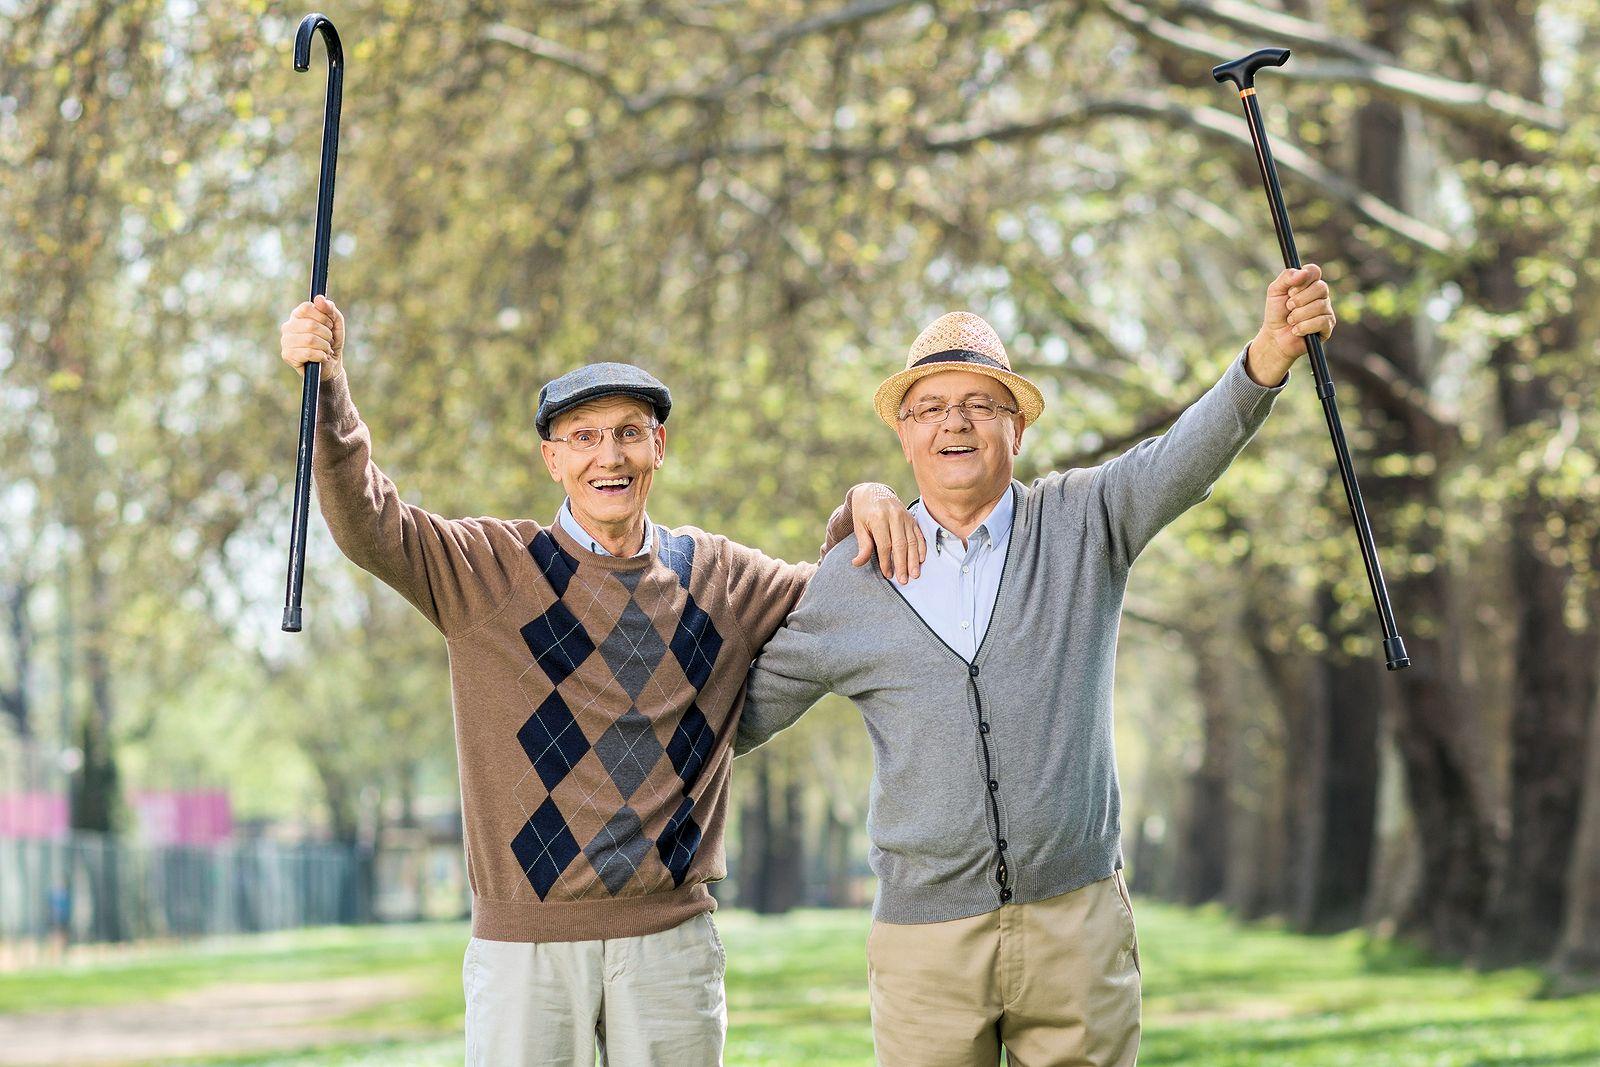 Two elderly gentlemen with canes gesturing happiness outdoors